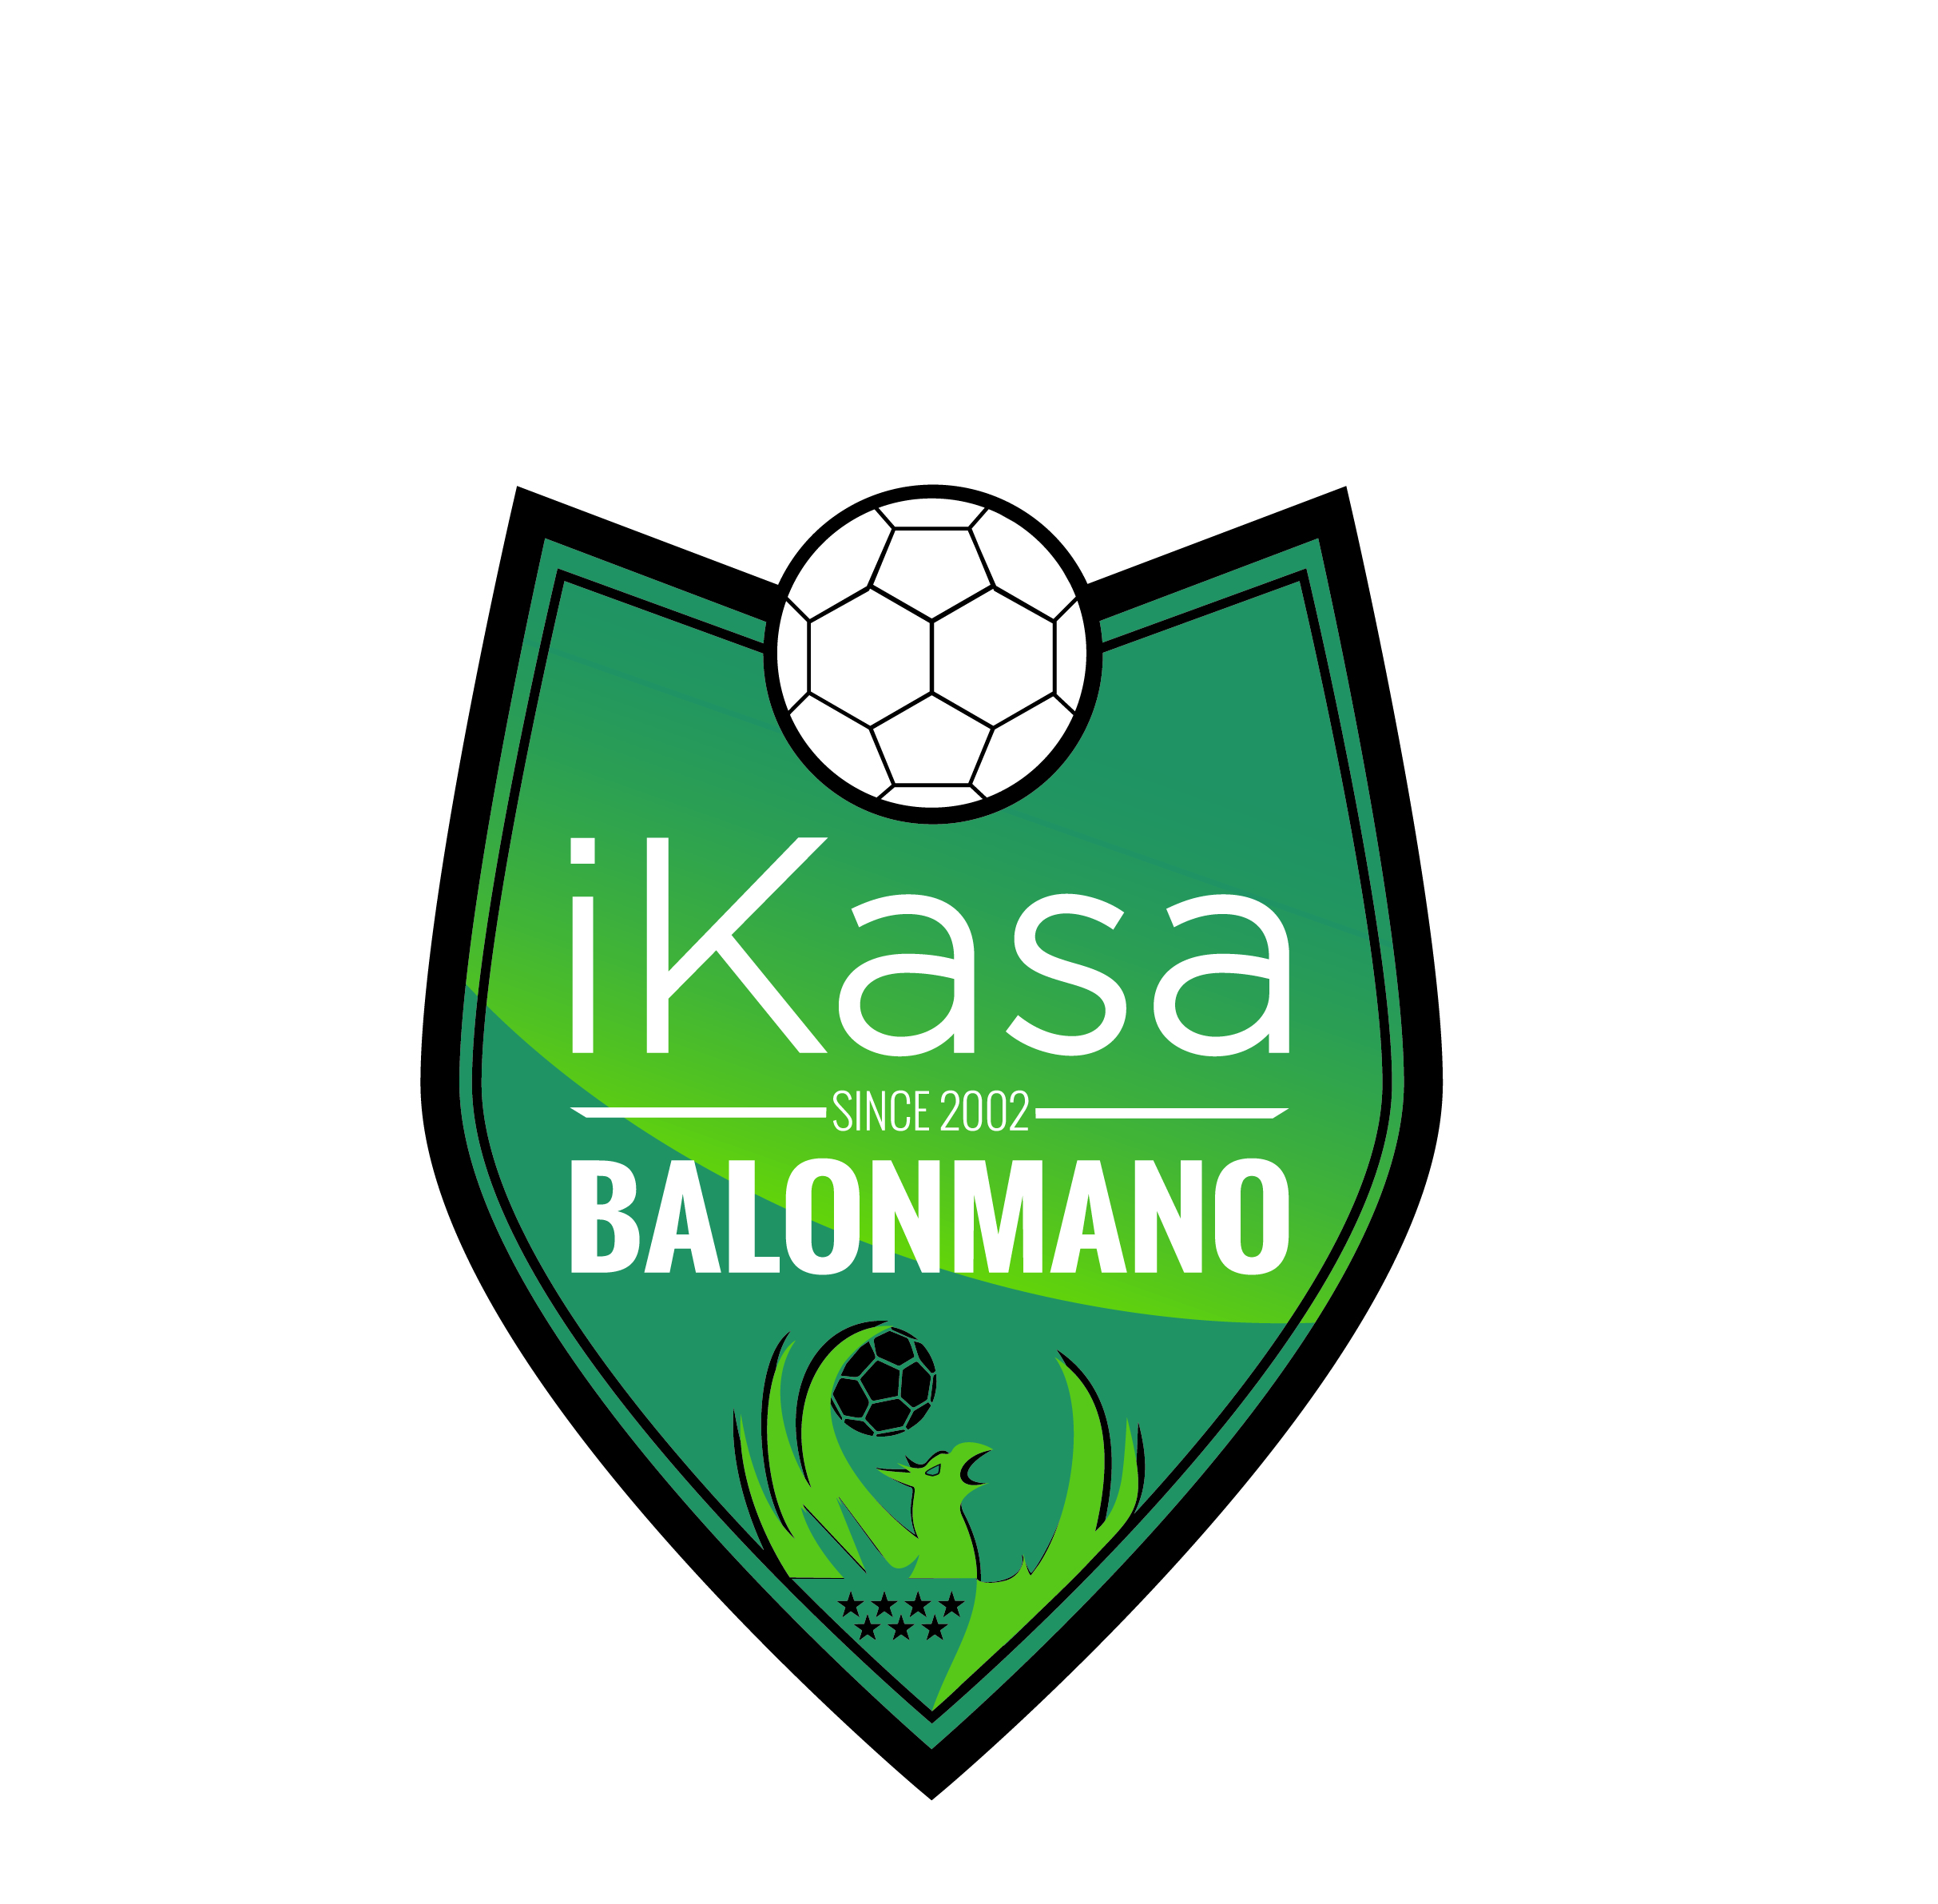 CLUB DEPORTIVO ELEMENTAL IKASA BALONMANO MADRID